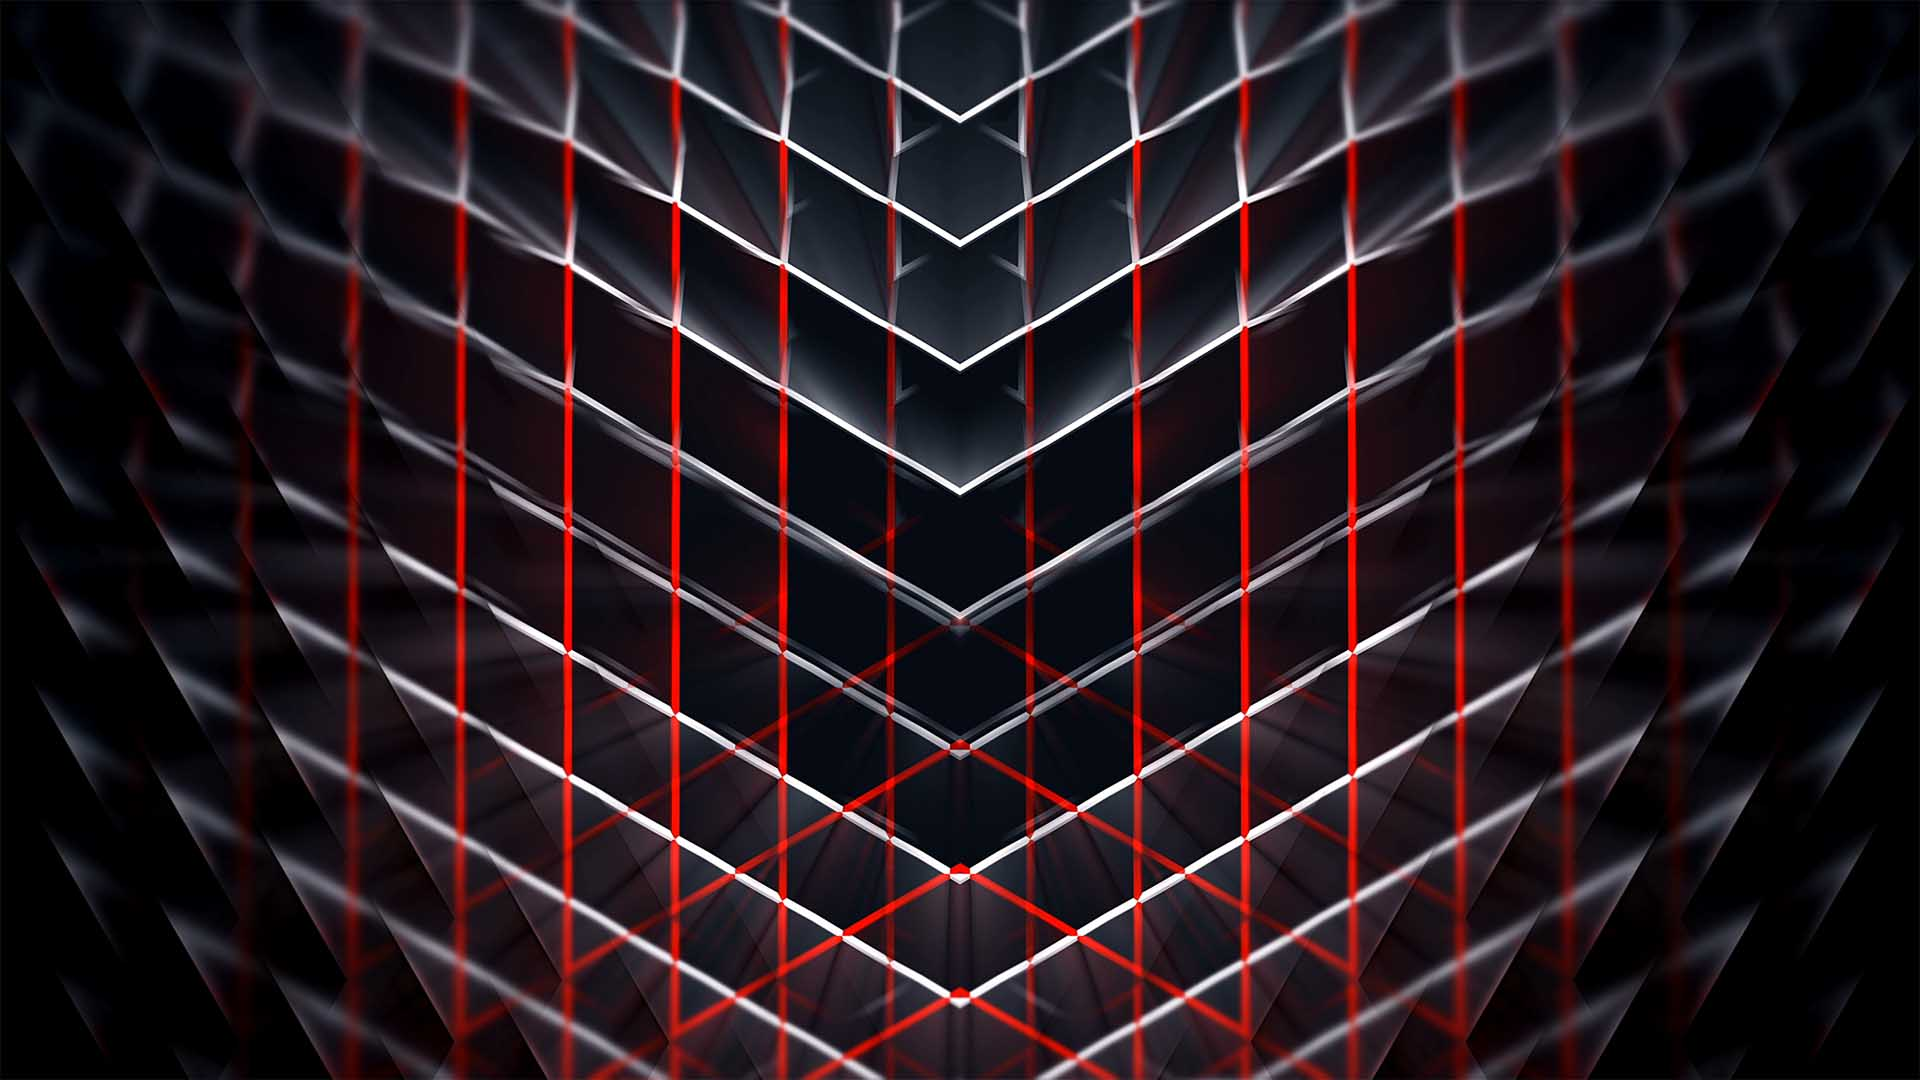 Strobing_Abstract_Art_Chakra_Pattern_Video_Footage_Vj_Loop